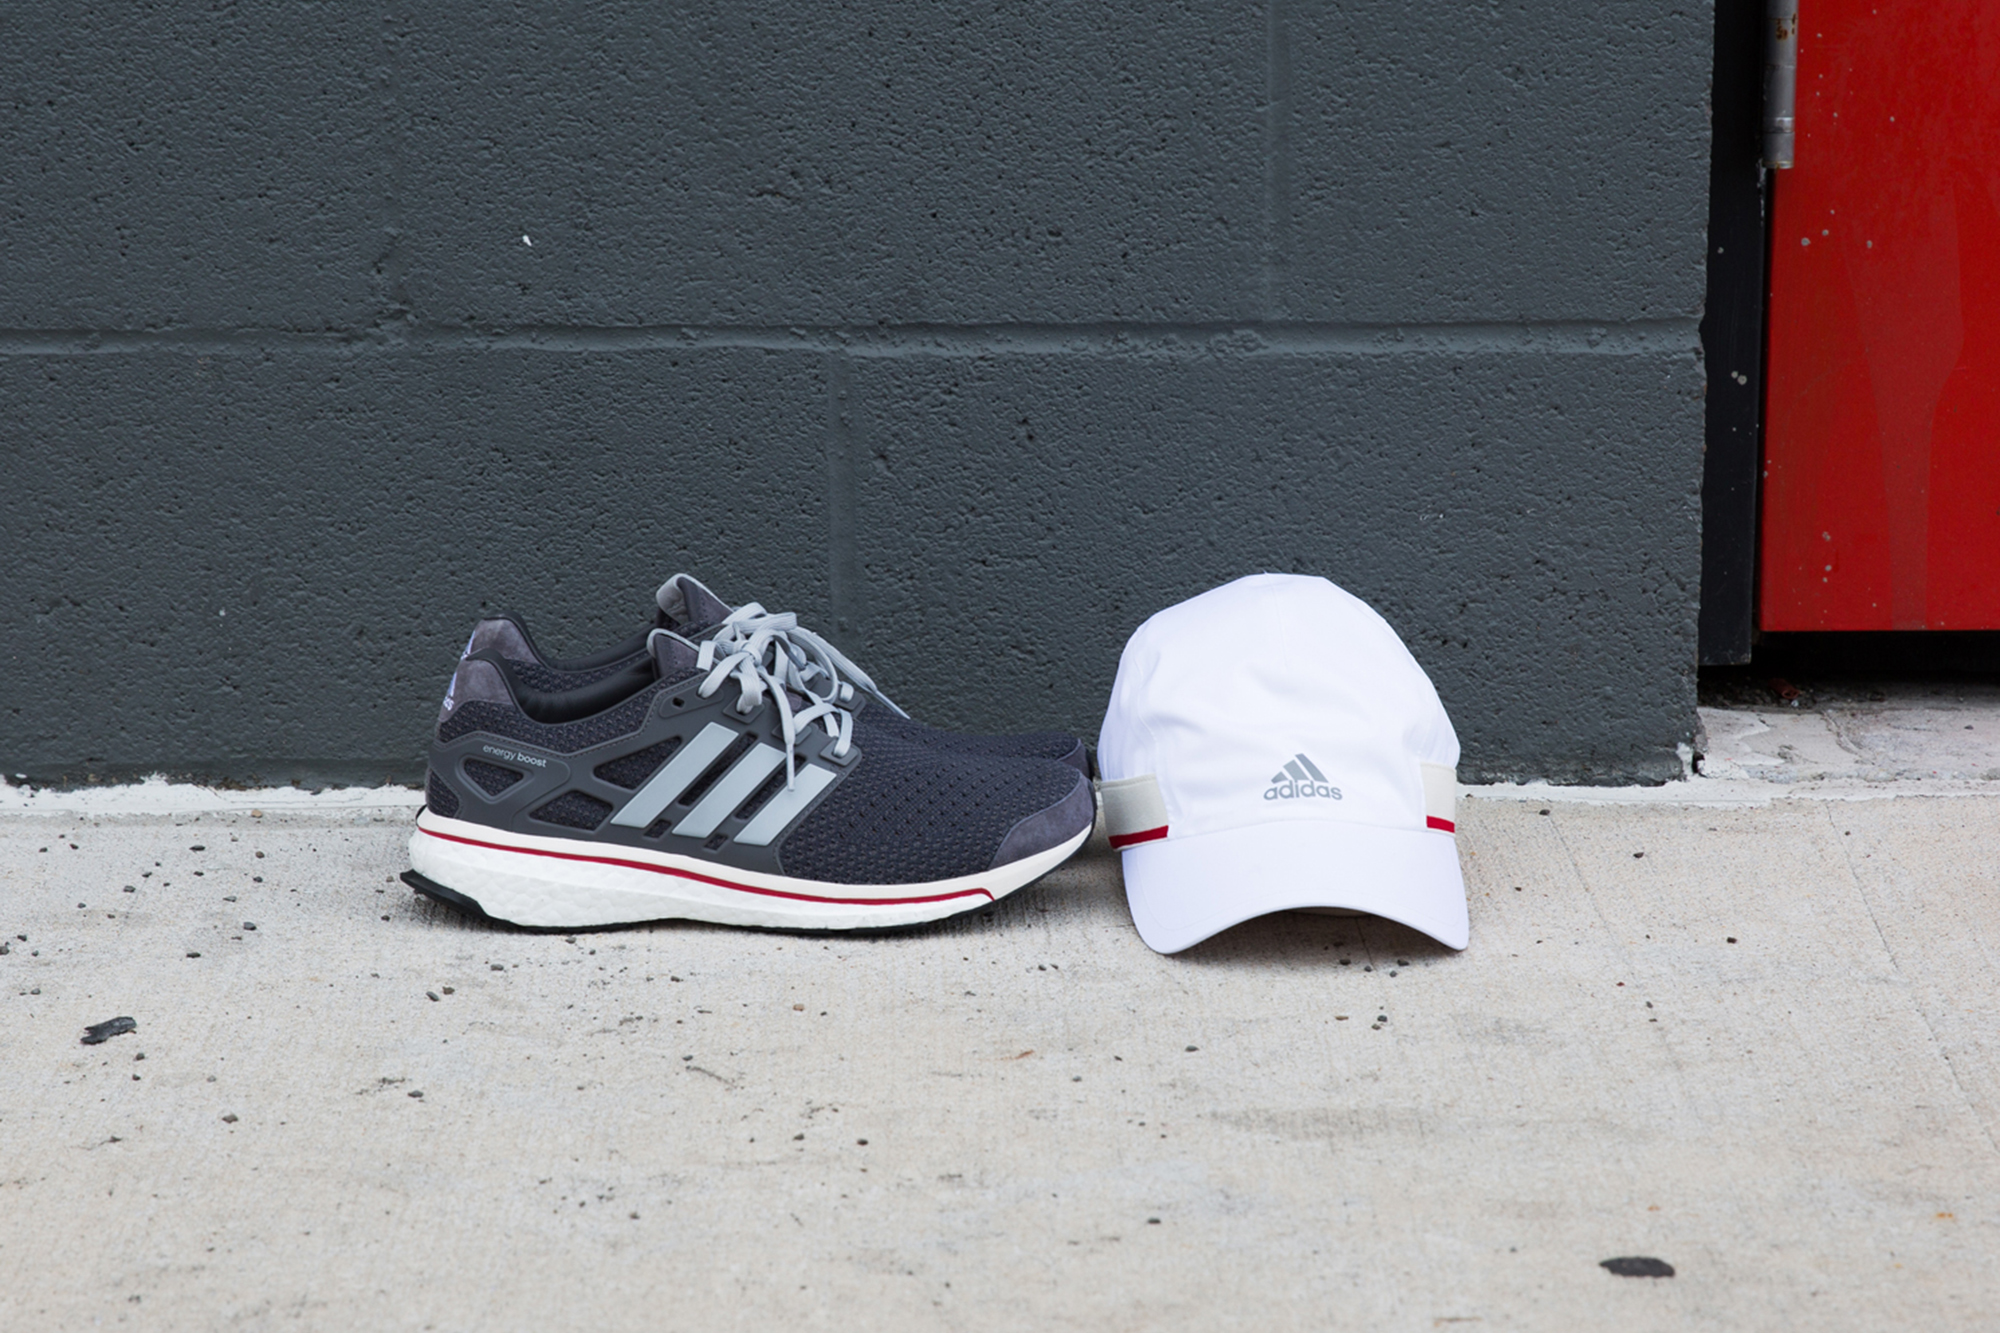 buy online 92b82 c9179 ... release date adidas run through time energy boost 4 1b5b9 706c2